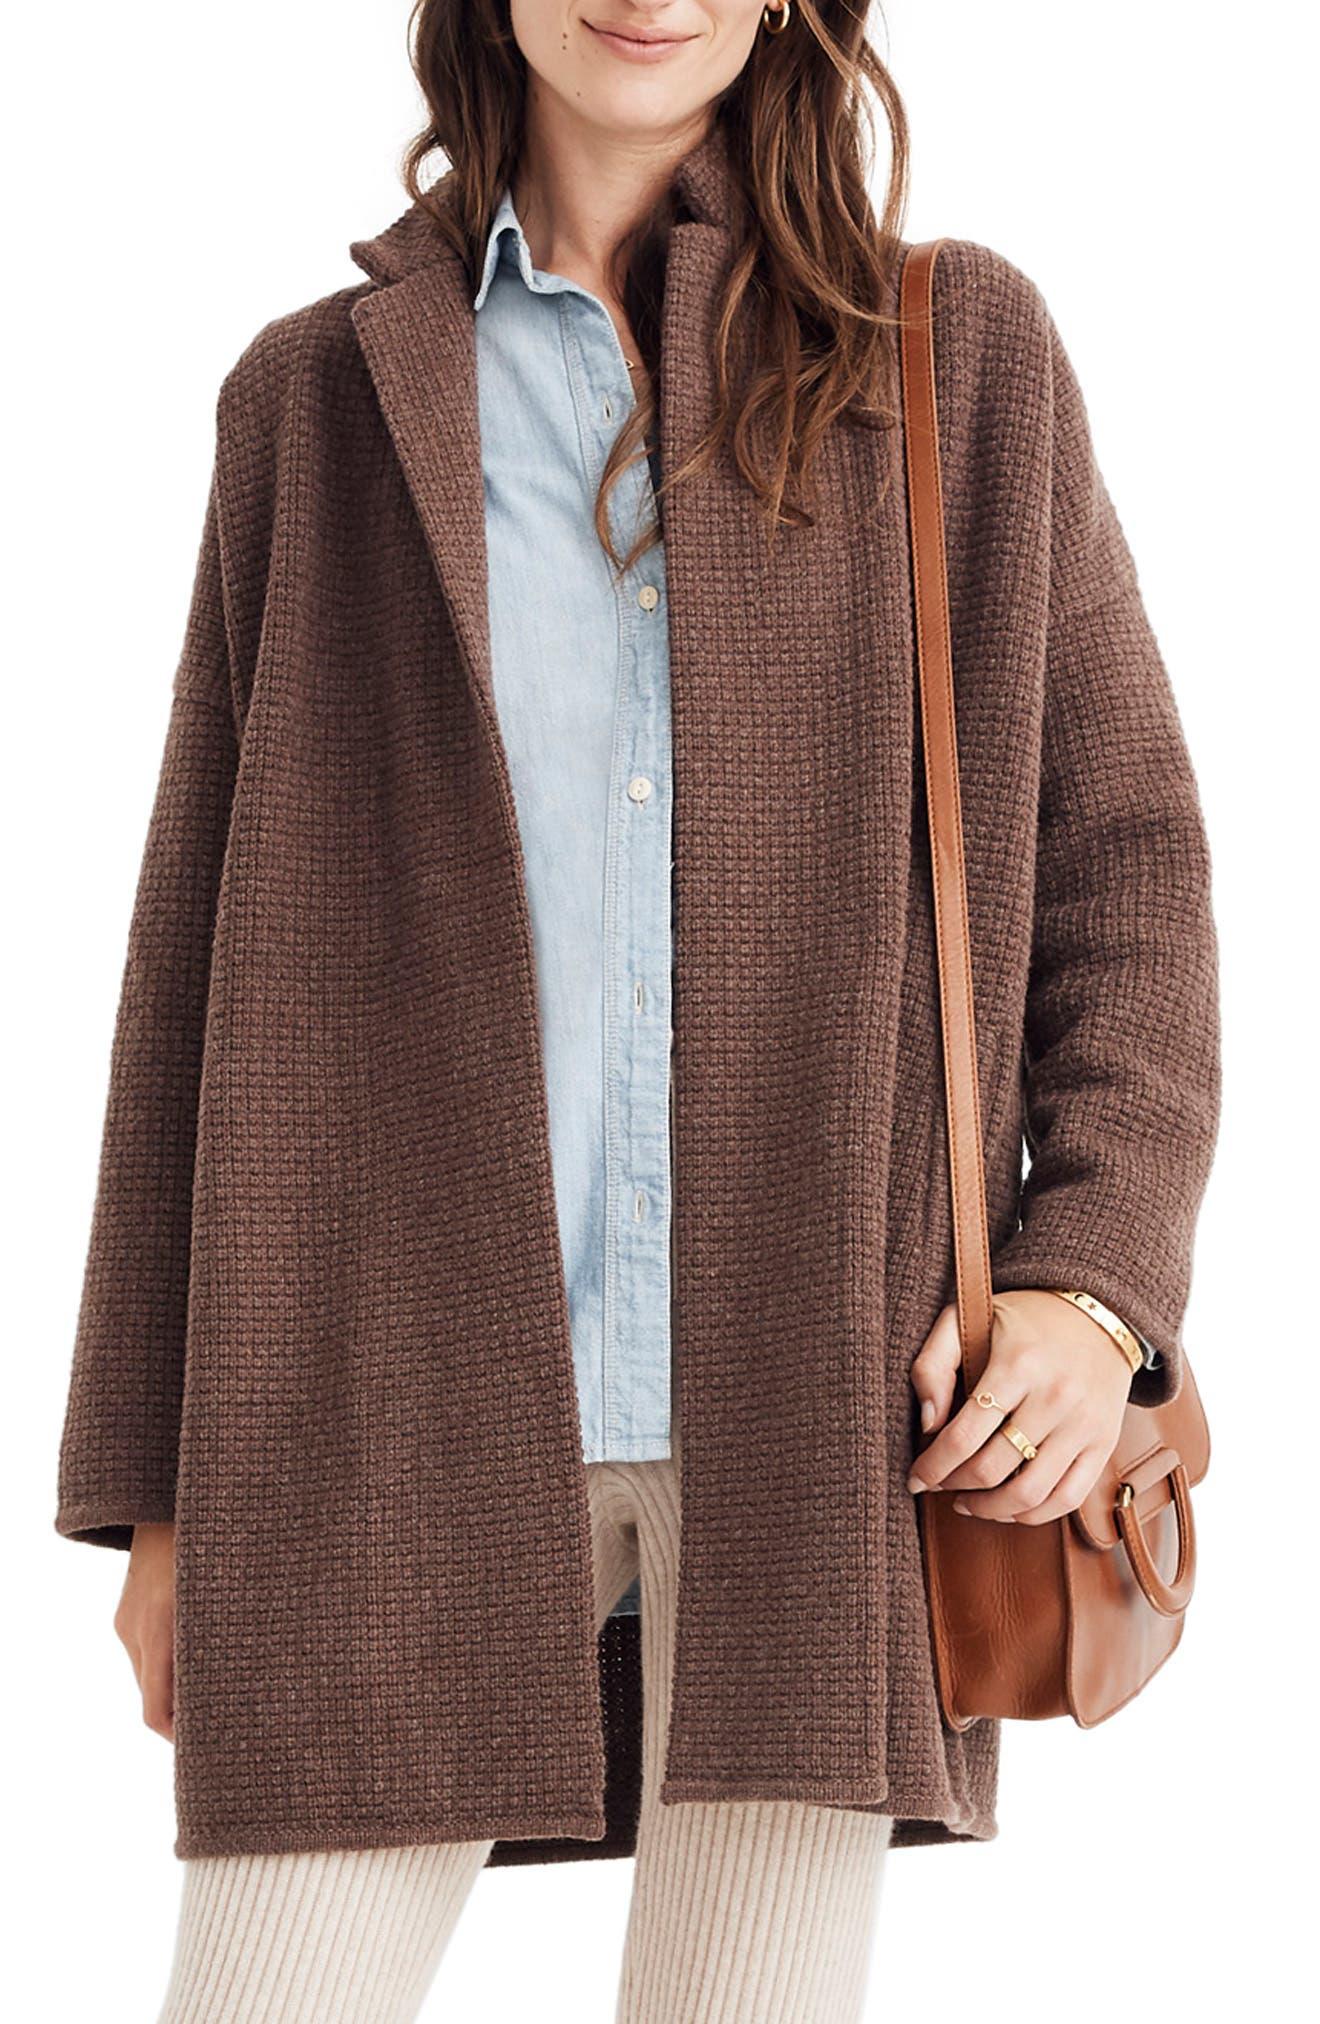 Chilton Sweater Coat,                             Main thumbnail 1, color,                             HEATHER COCOA